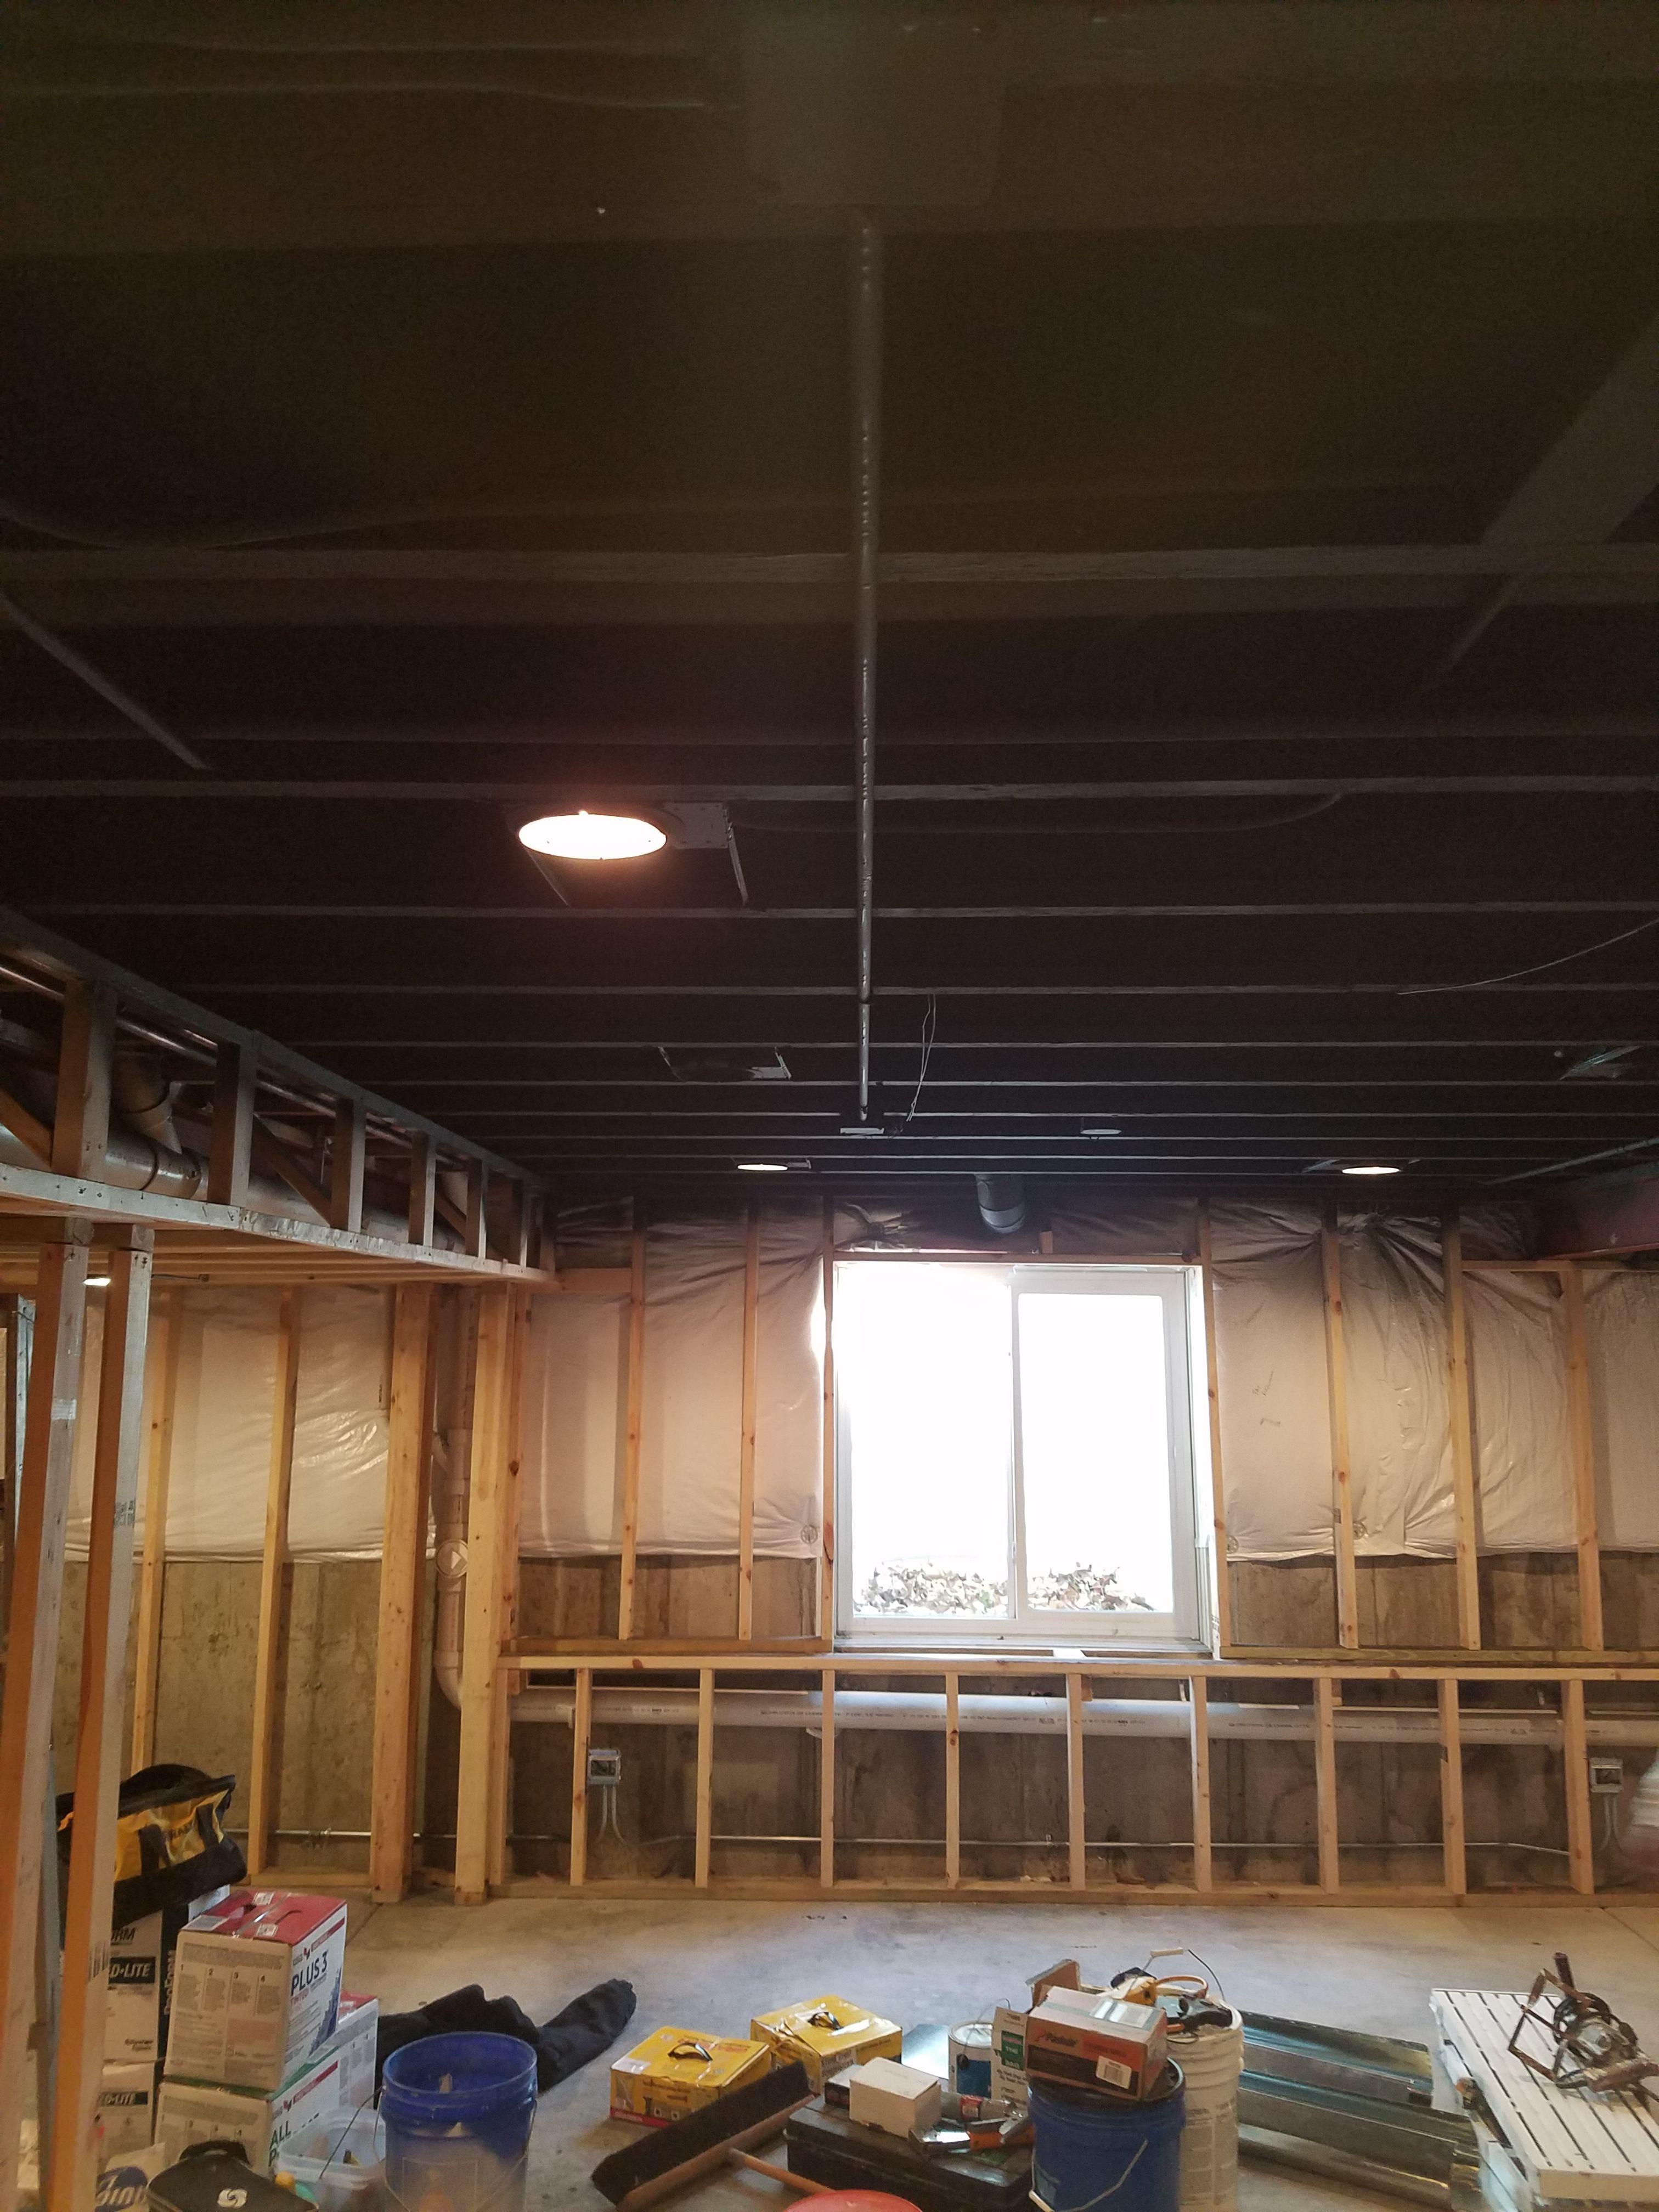 Basement Ceiling Painted Black Before Drywall In 2020 Basement